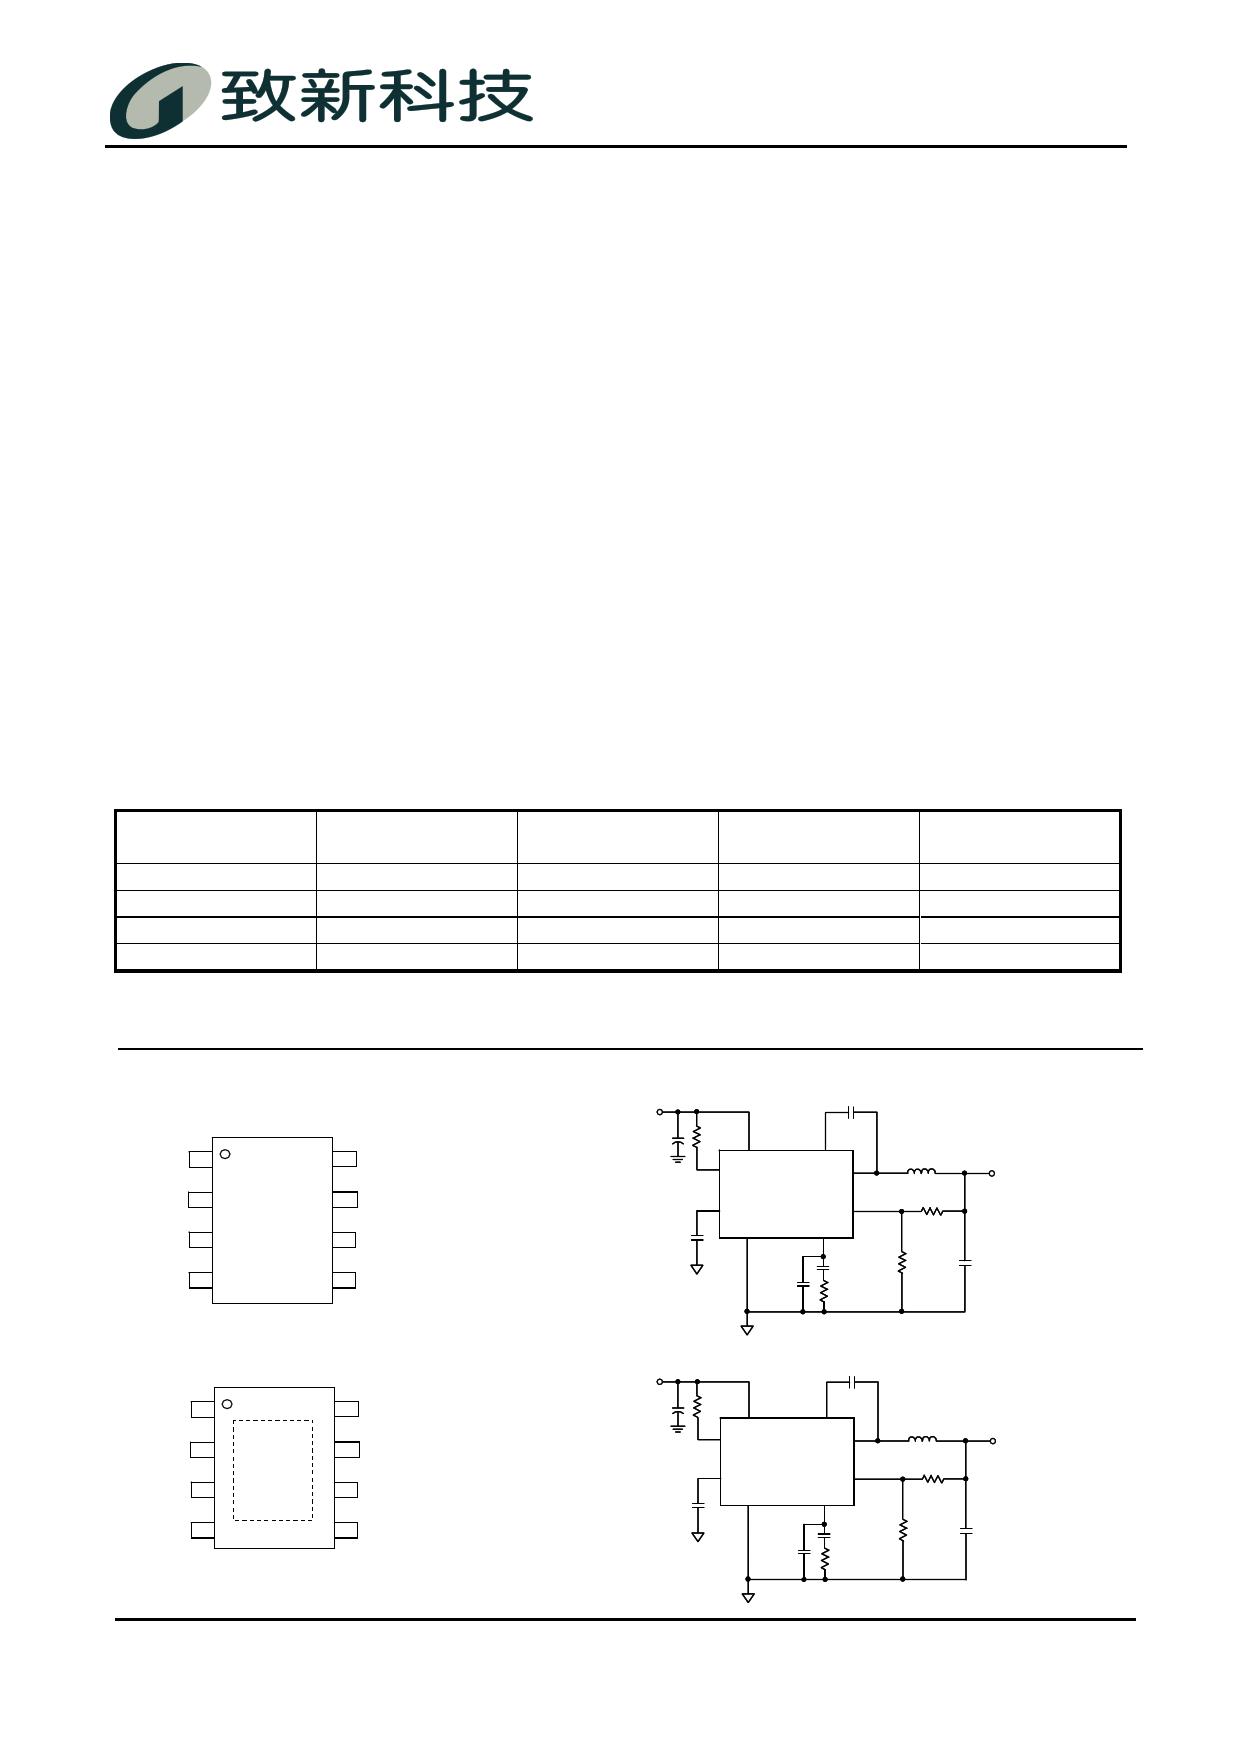 G5797A Datasheet, G5797A PDF,ピン配置, 機能